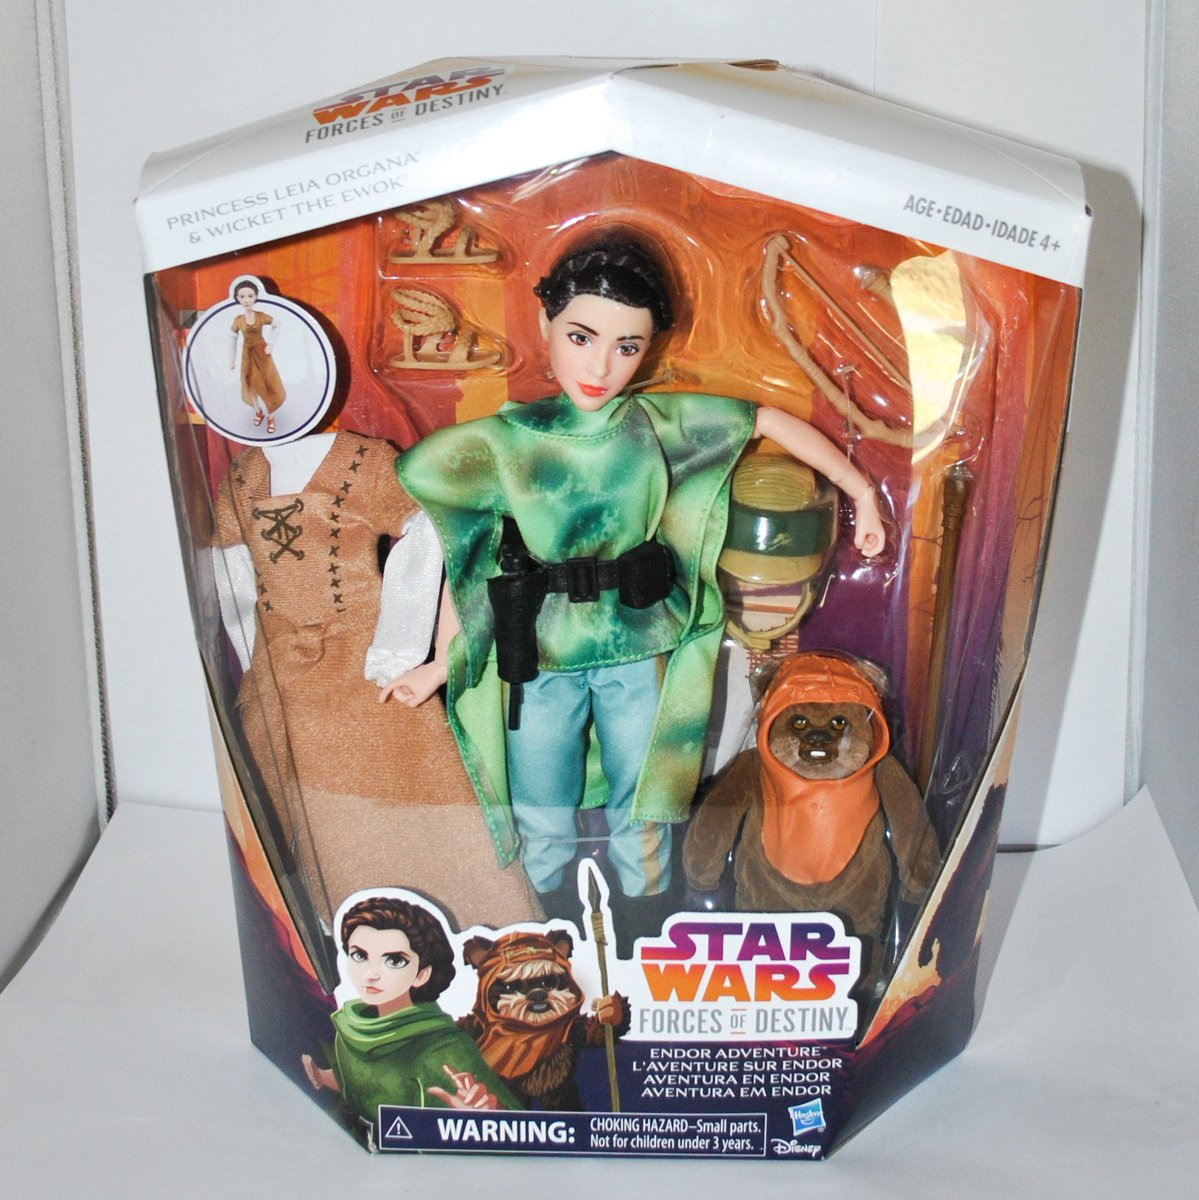 Star Wars Forces du destin Princesse Leia Organa /& Wicket Ewok Endor aventure